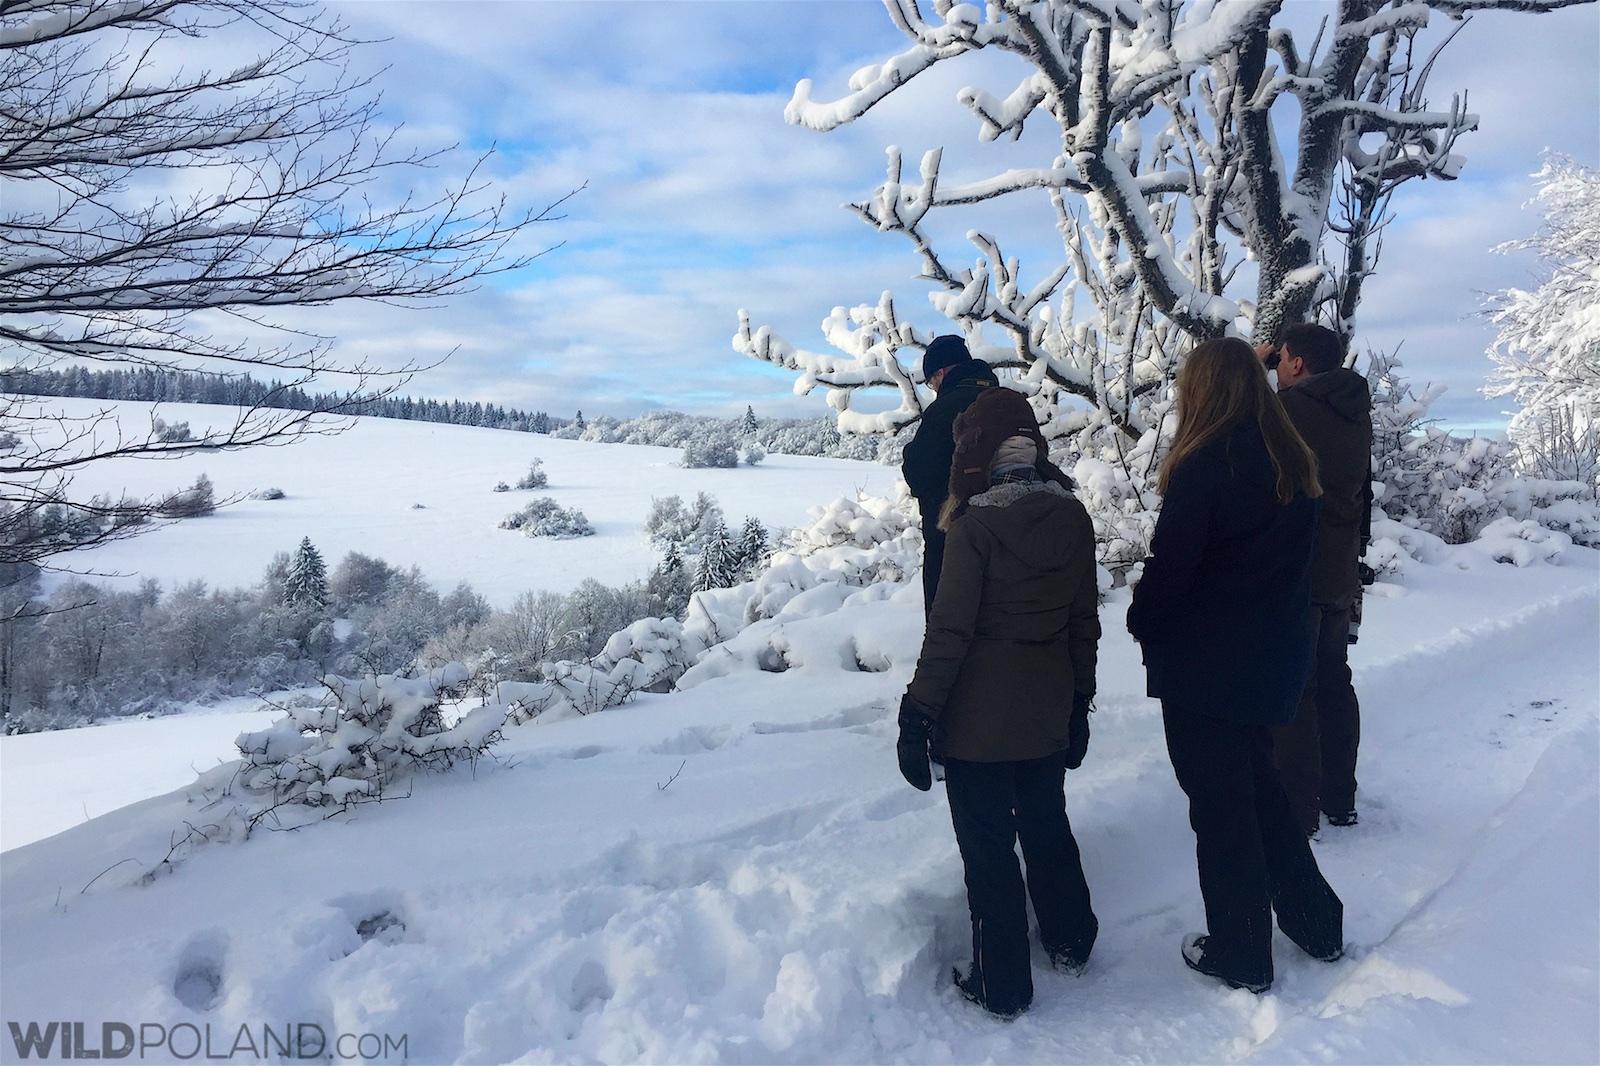 Scanning for wolves in Eastern Carpathians